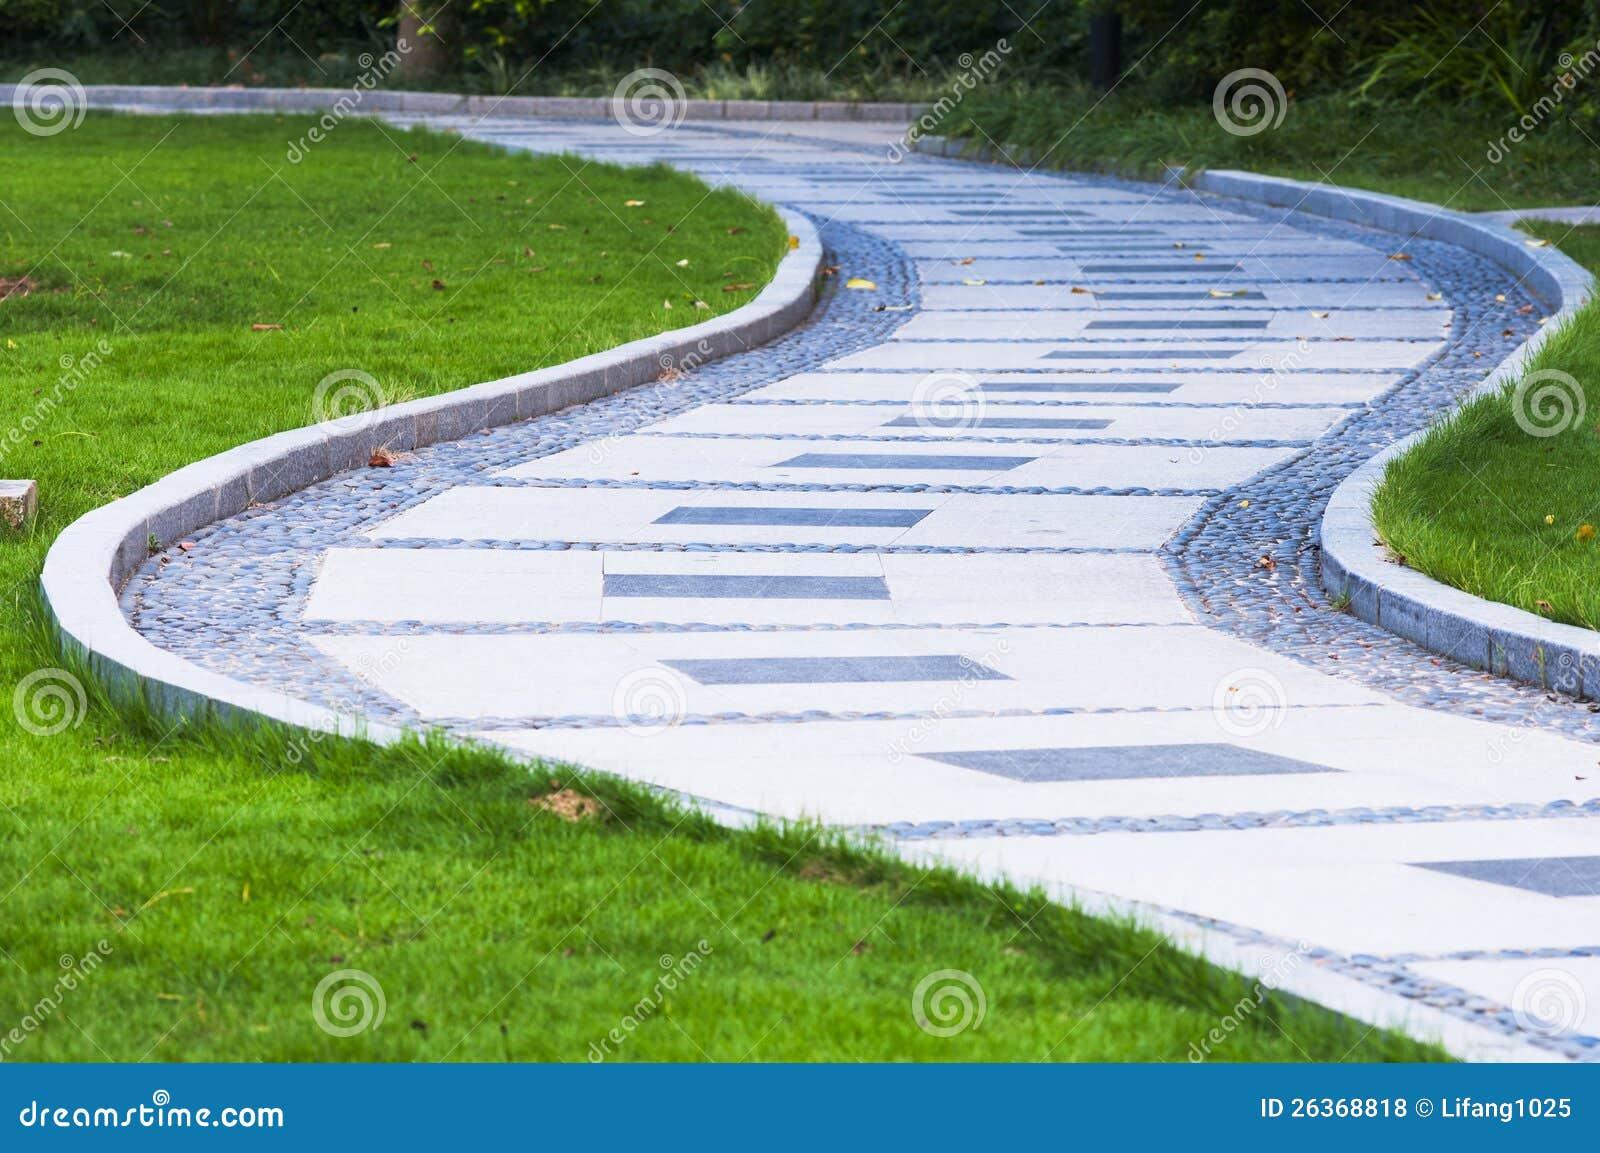 Friedensstraße im Park